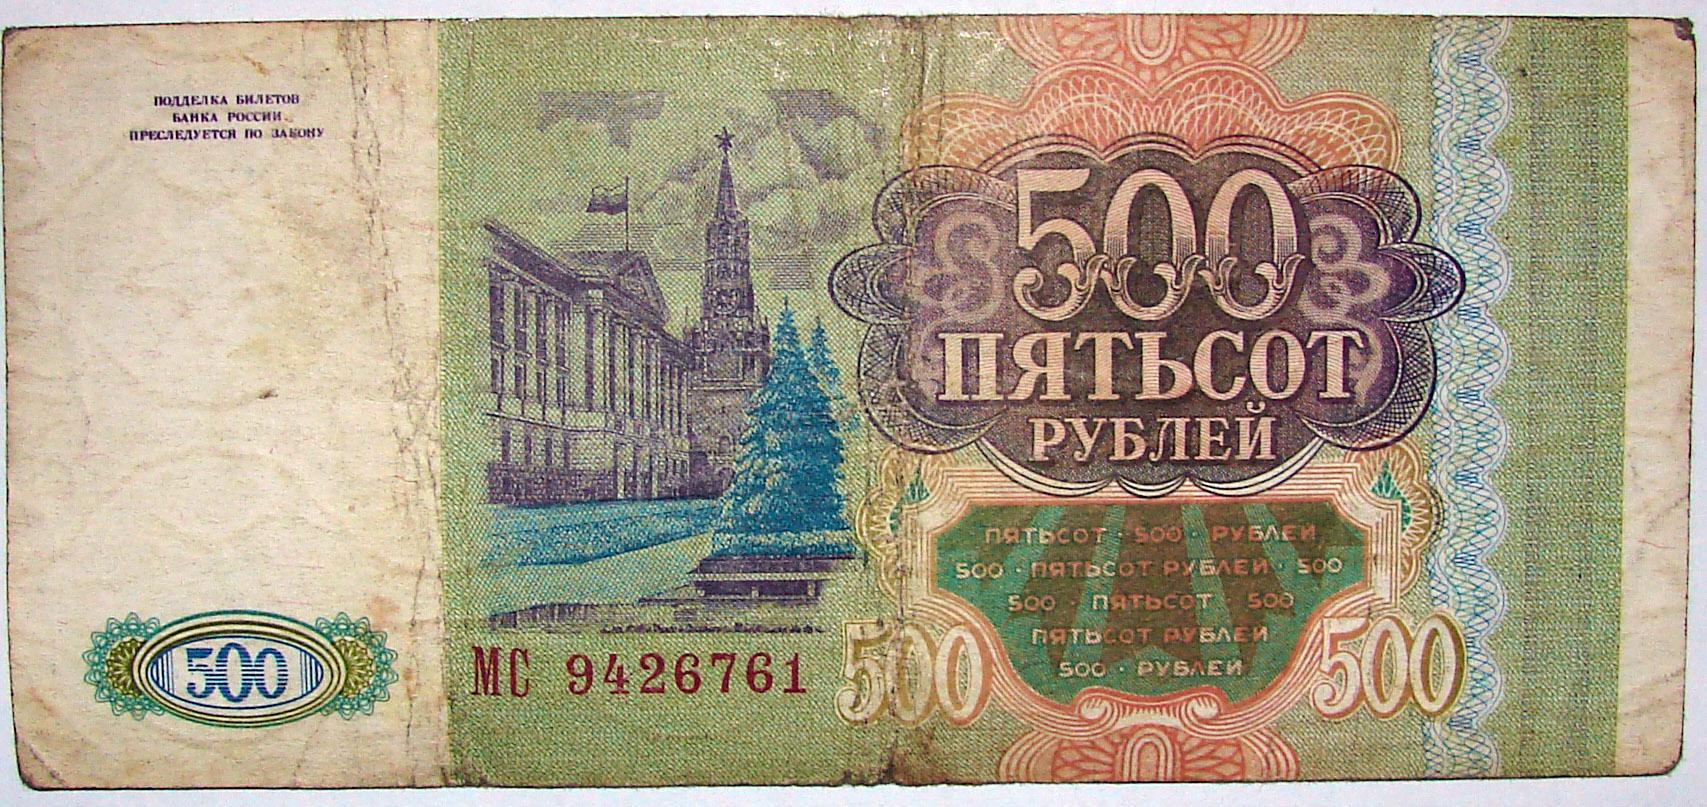 Шлюха до 500 рублей барнаул 21 фотография